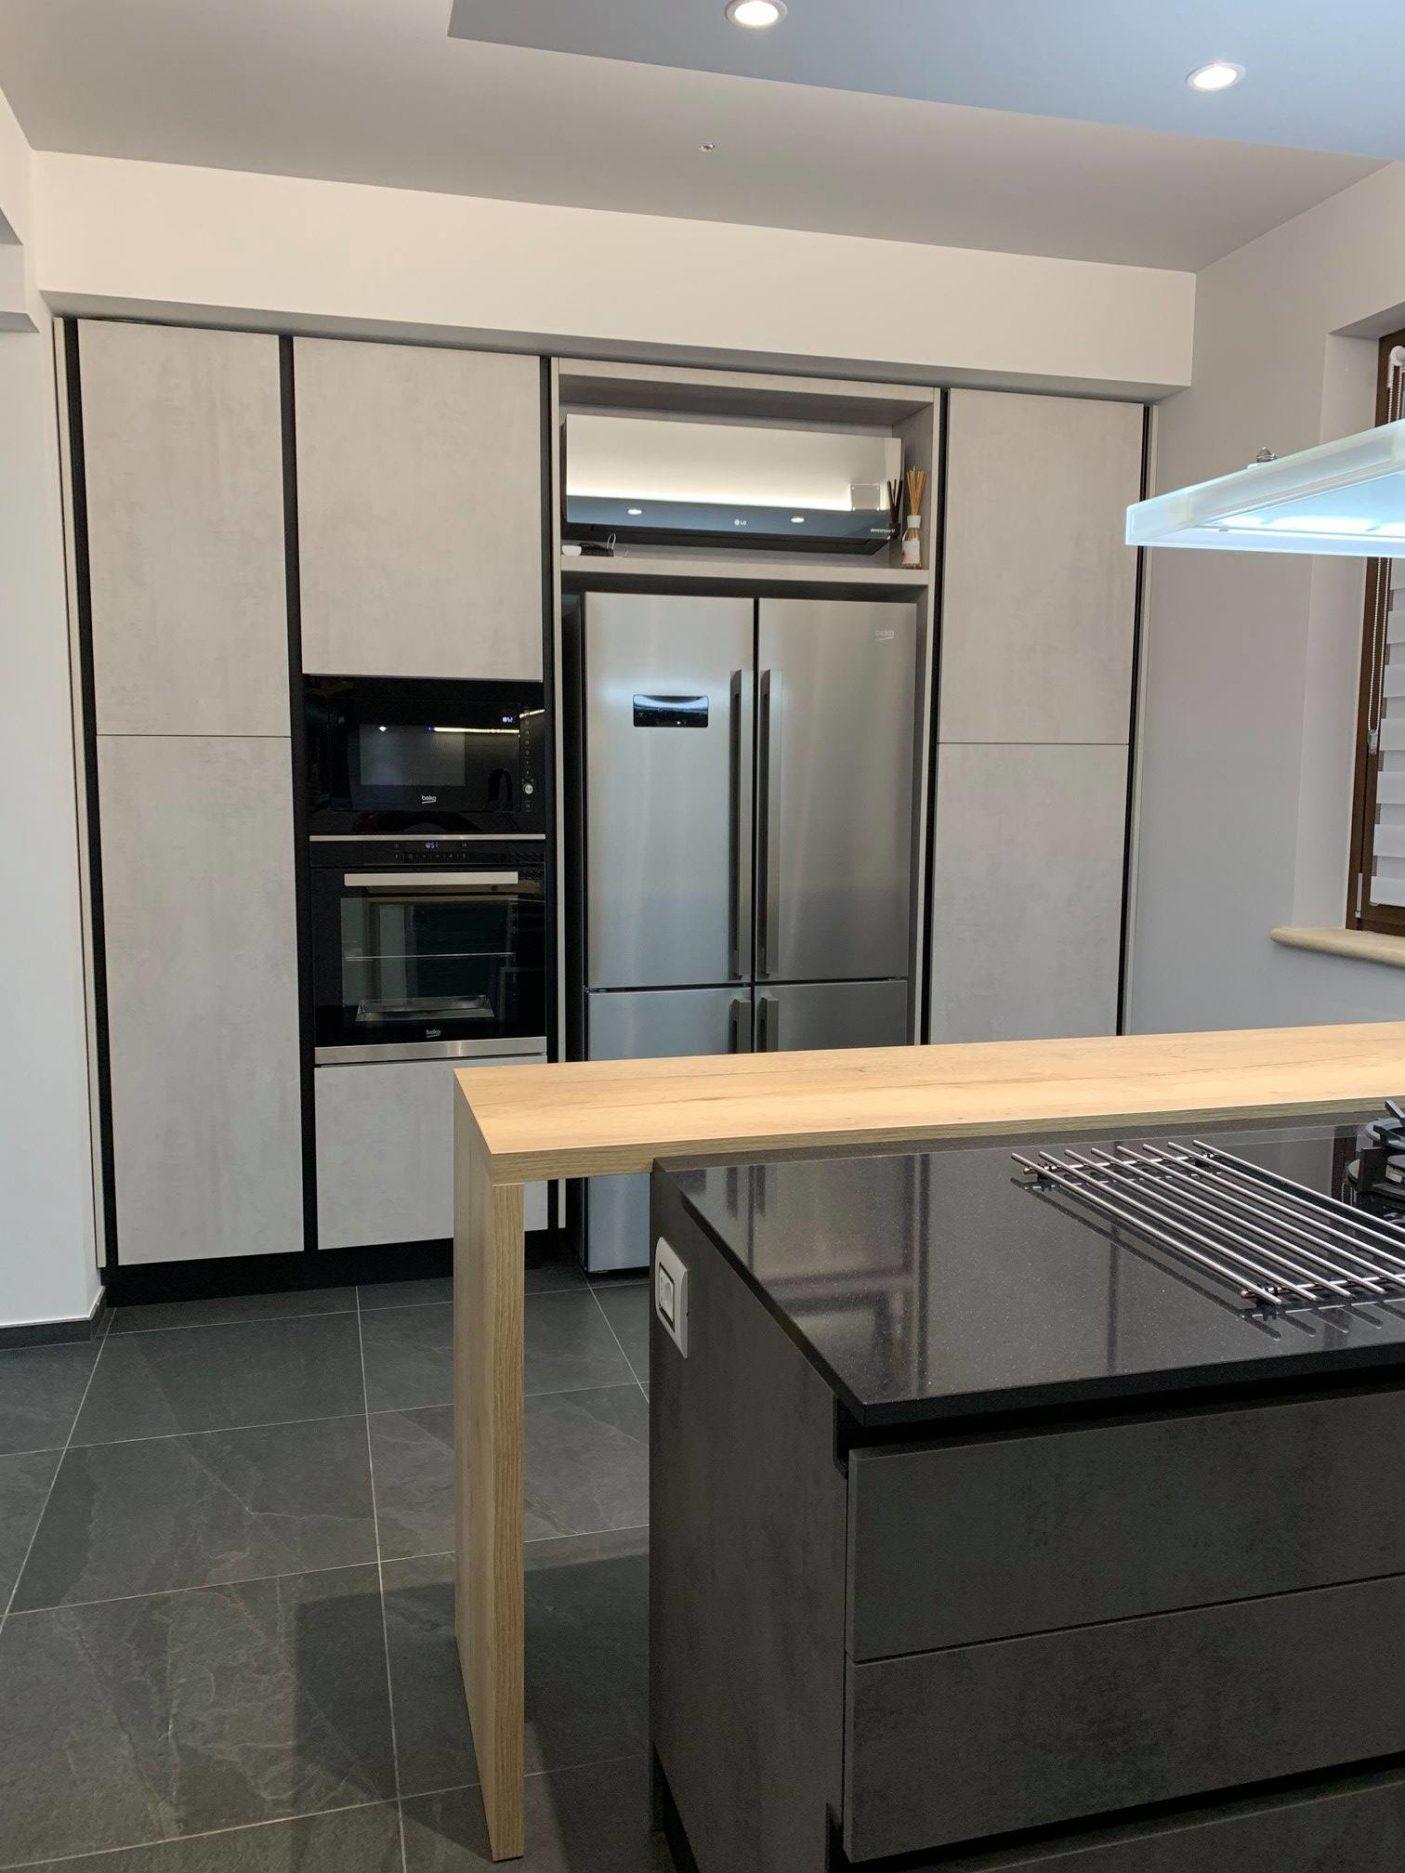 Cucina-Creo-Kitchens-Tablet-Personalizzata5.jpg